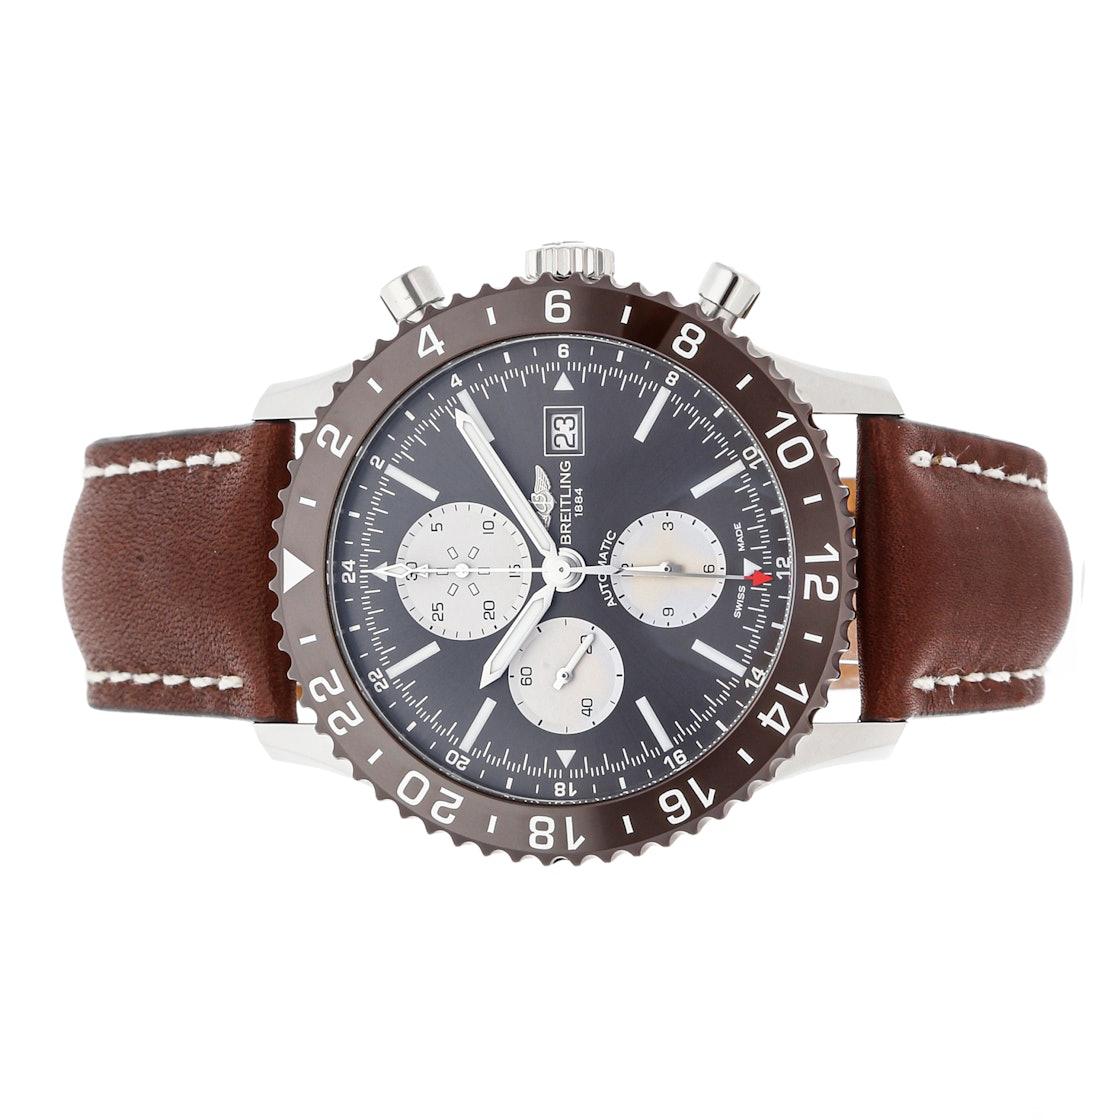 Breitling Chronoliner Y2431033/Q621